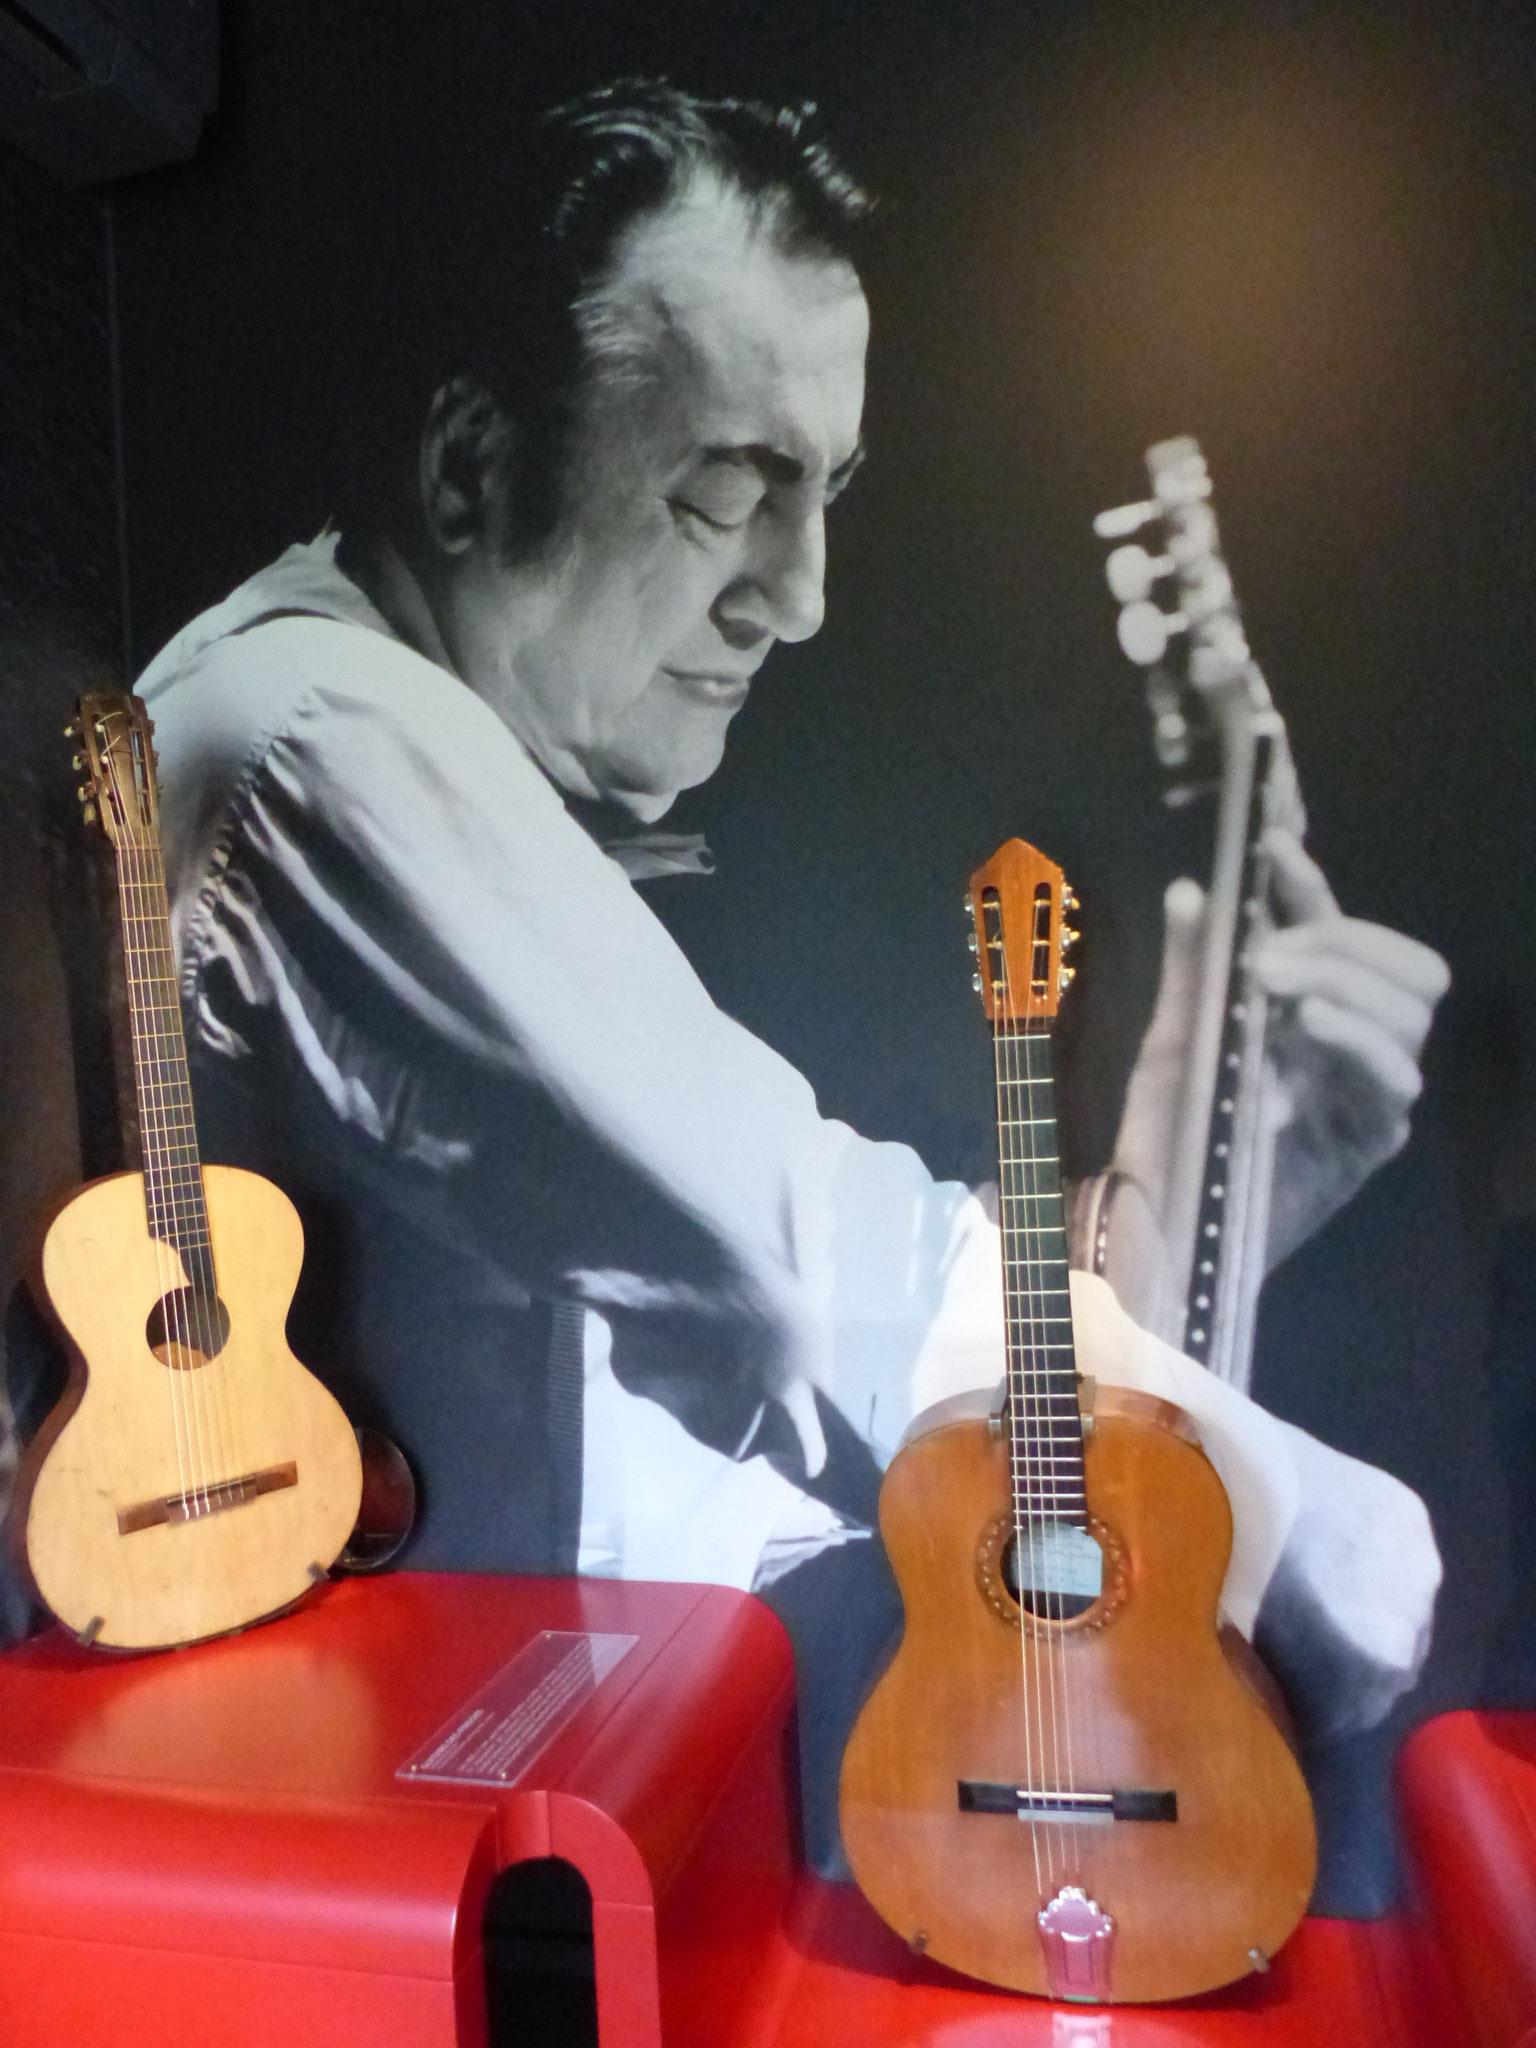 Sa guitare offerte par Georges Brassens